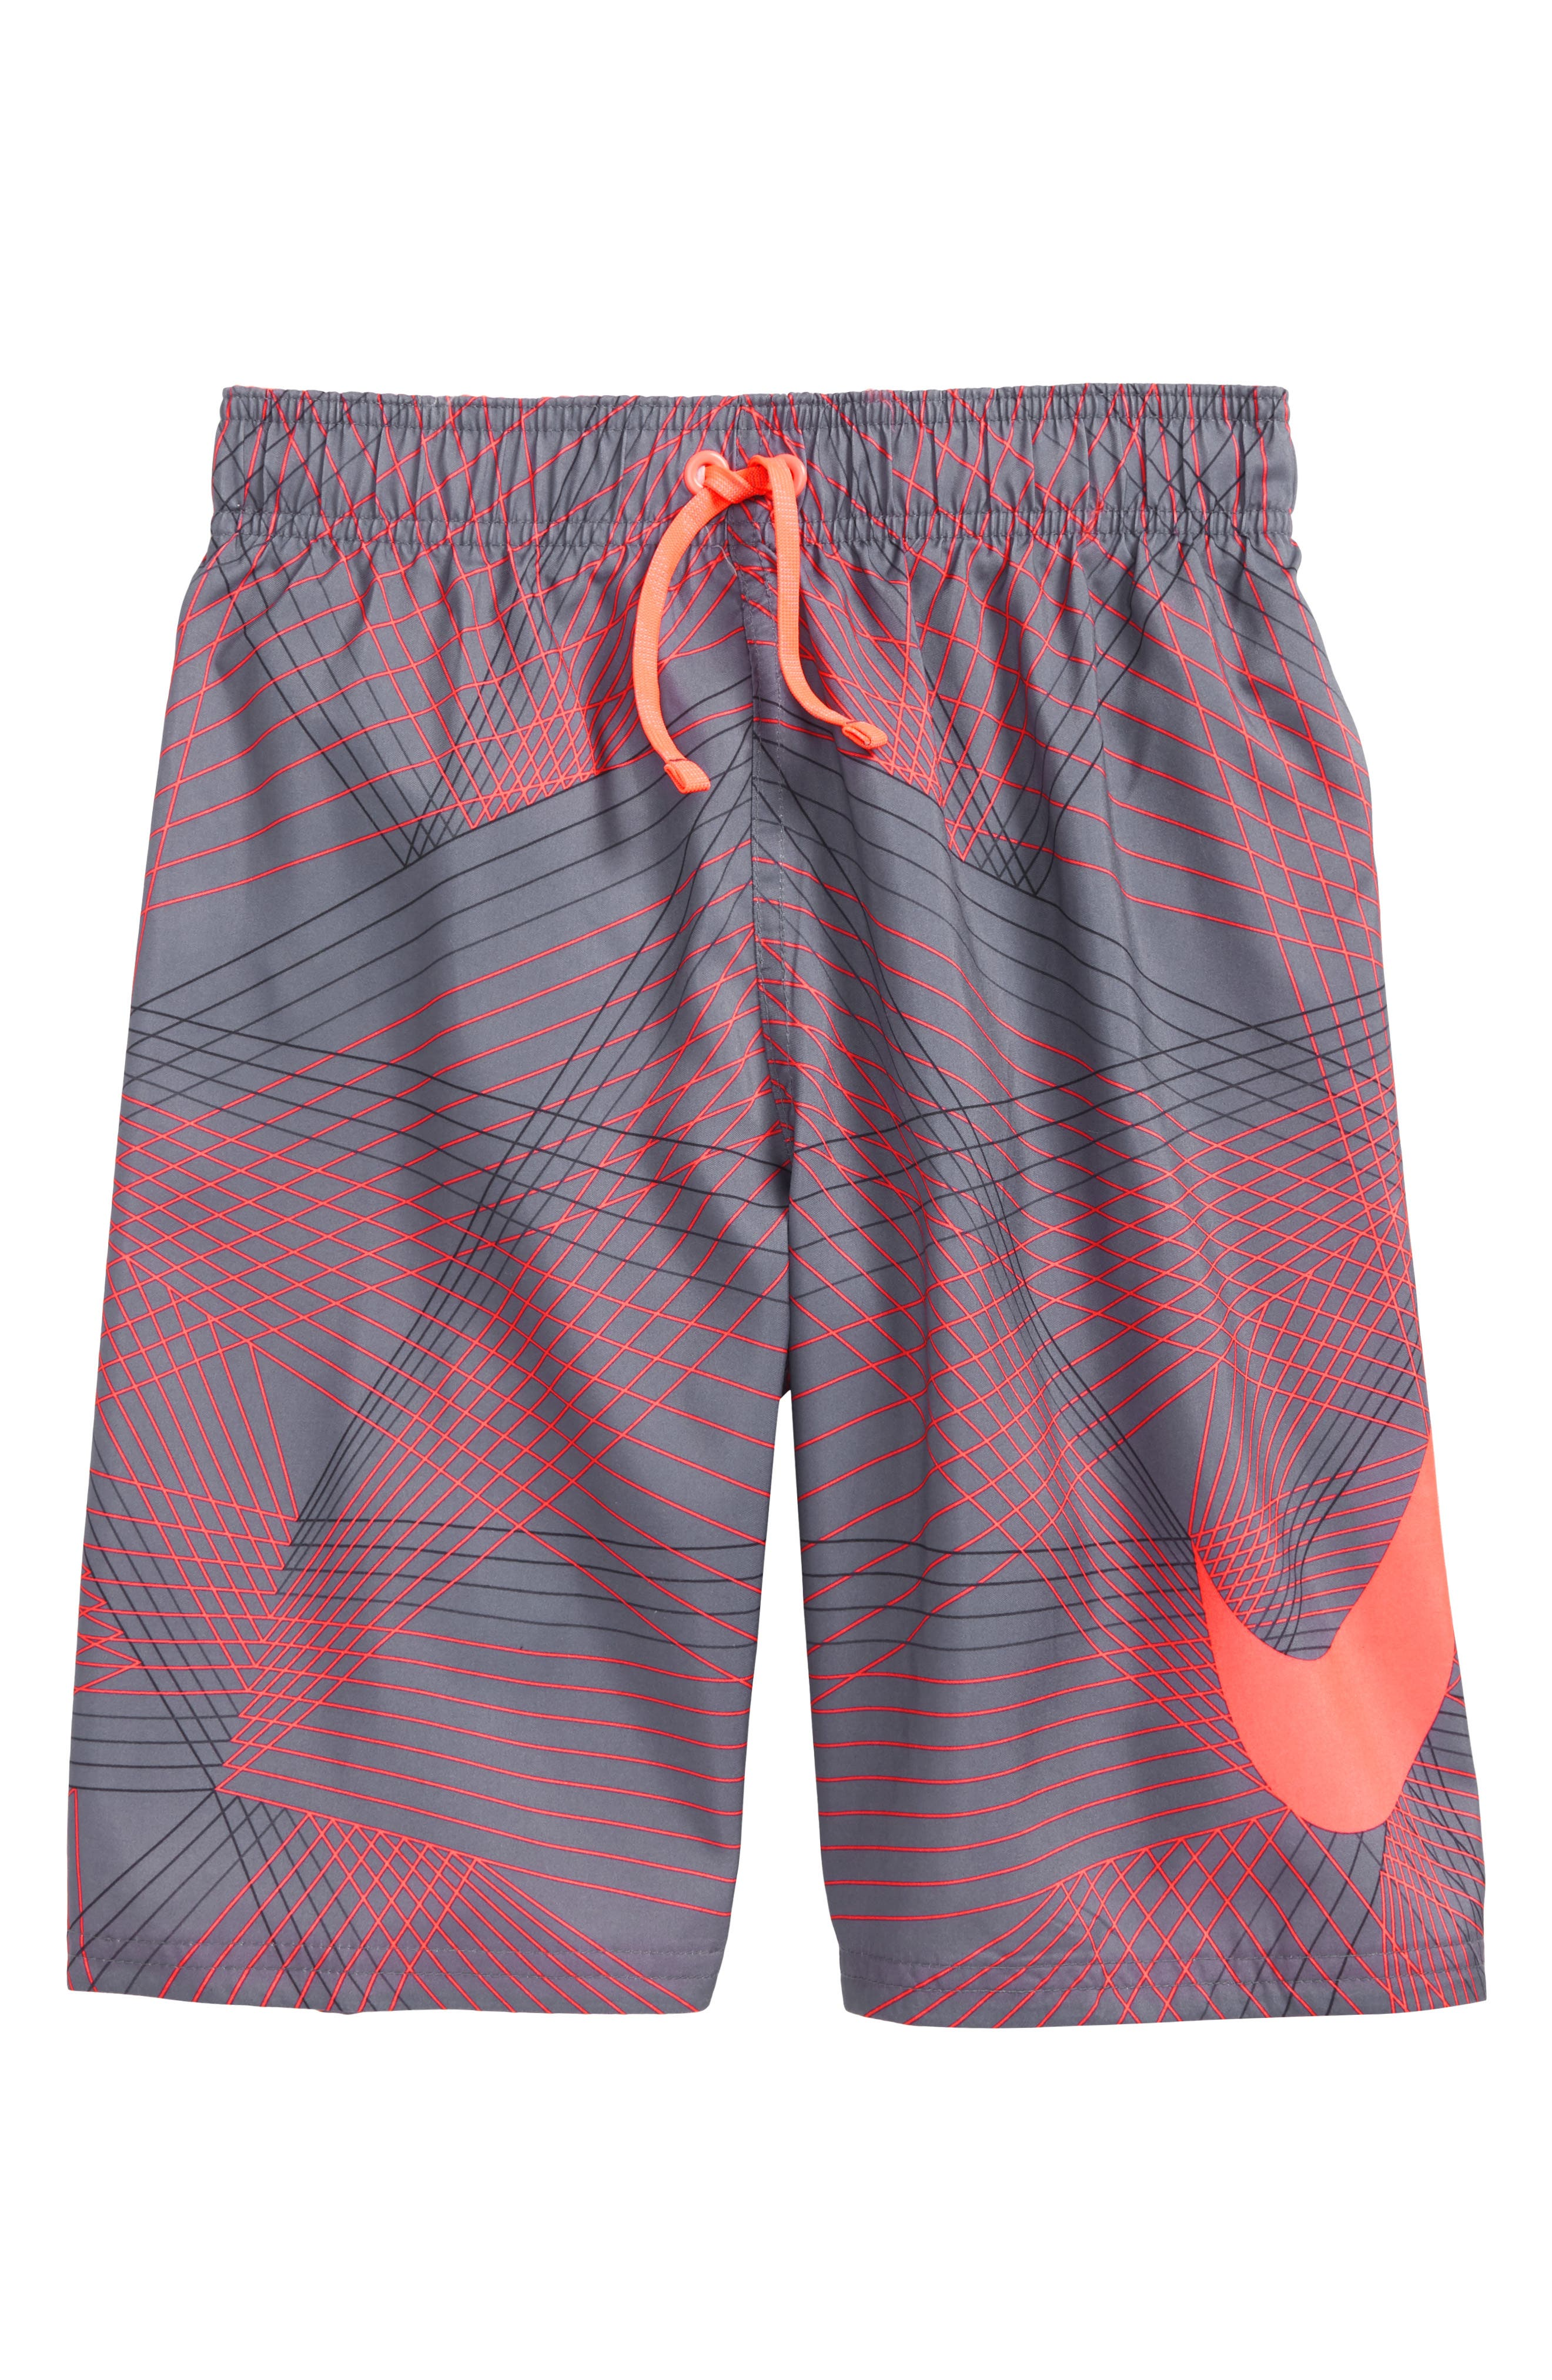 Breaker Volley Shorts,                             Main thumbnail 1, color,                             Light Carbon